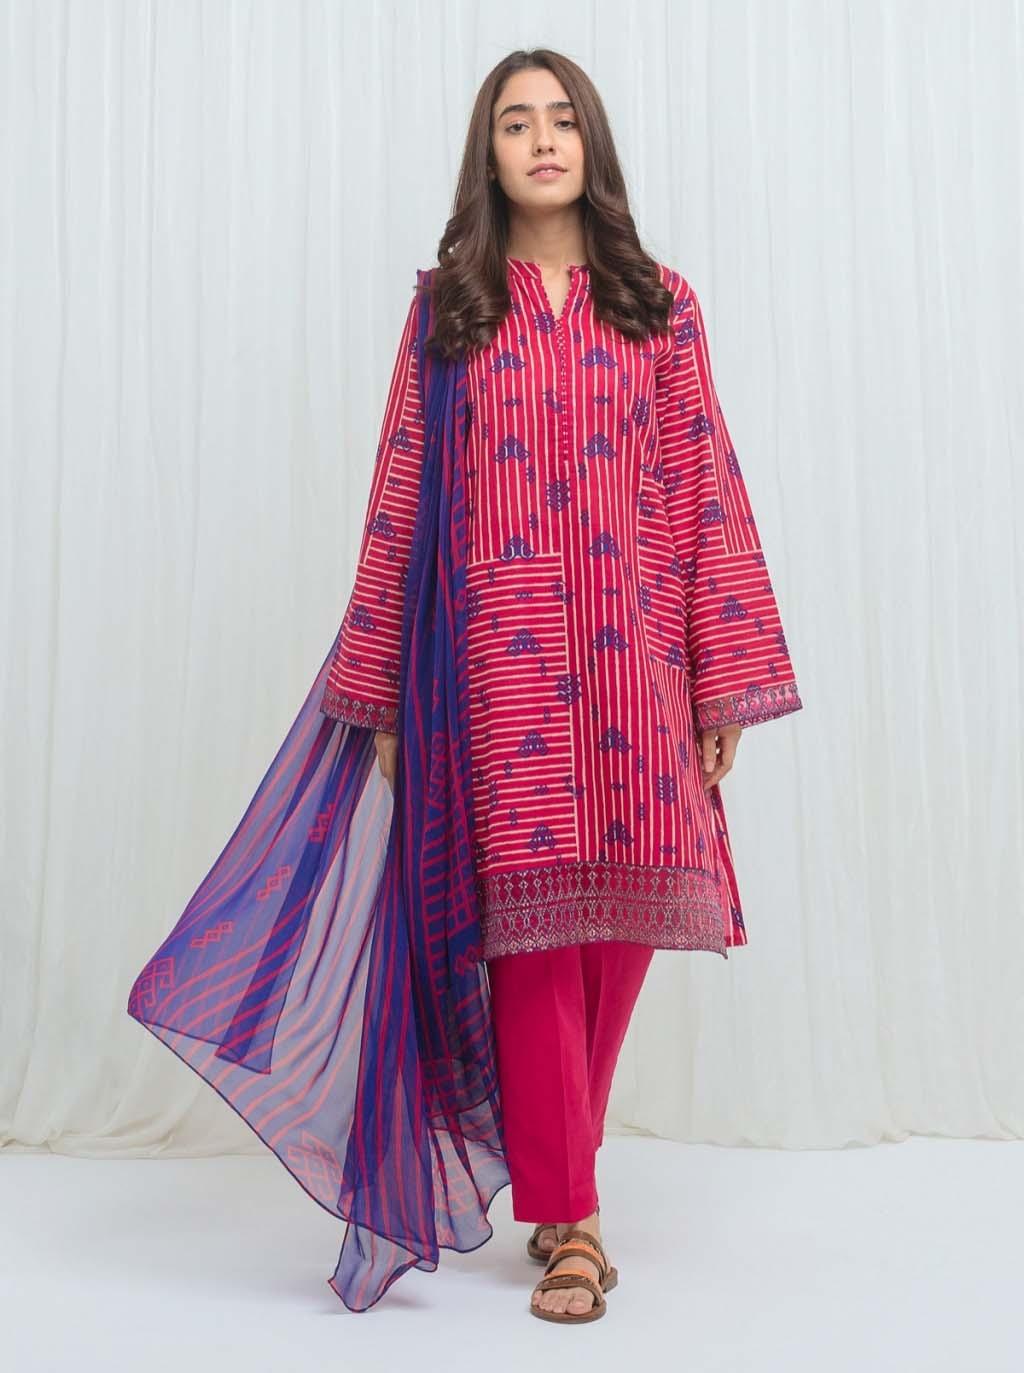 16196305950_large_16134785010_Beechtree-Sale-Beechtree-New-new-winter-collection-2020-online-shopping-in-Pakistan-Beechtree-new-winter-collection-2020-online-shopping-.jpg